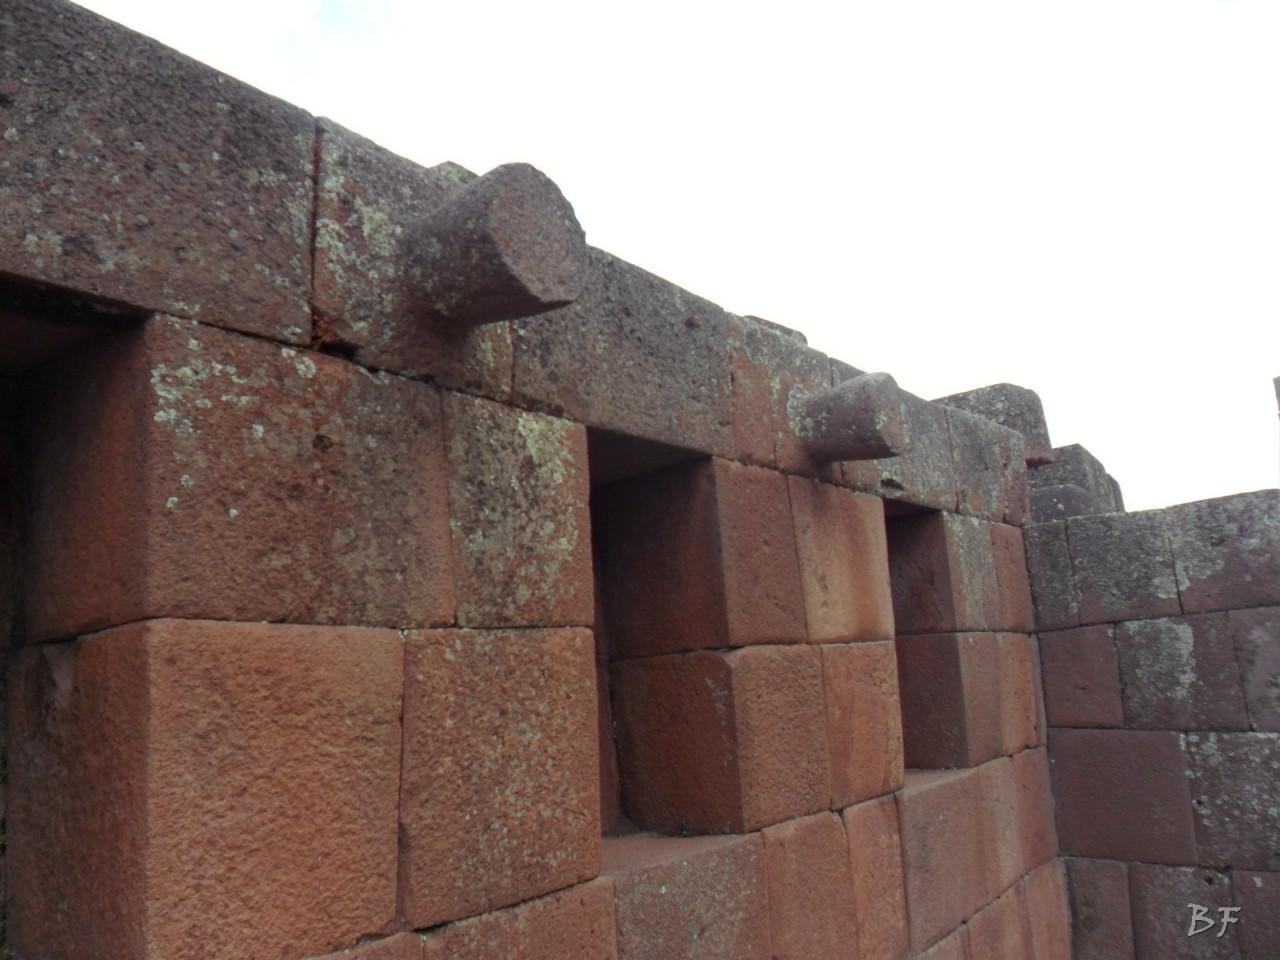 Mura-Poligonali-Megaliti-Altari-Rupestri-Pisac-Cusco-Perù-49